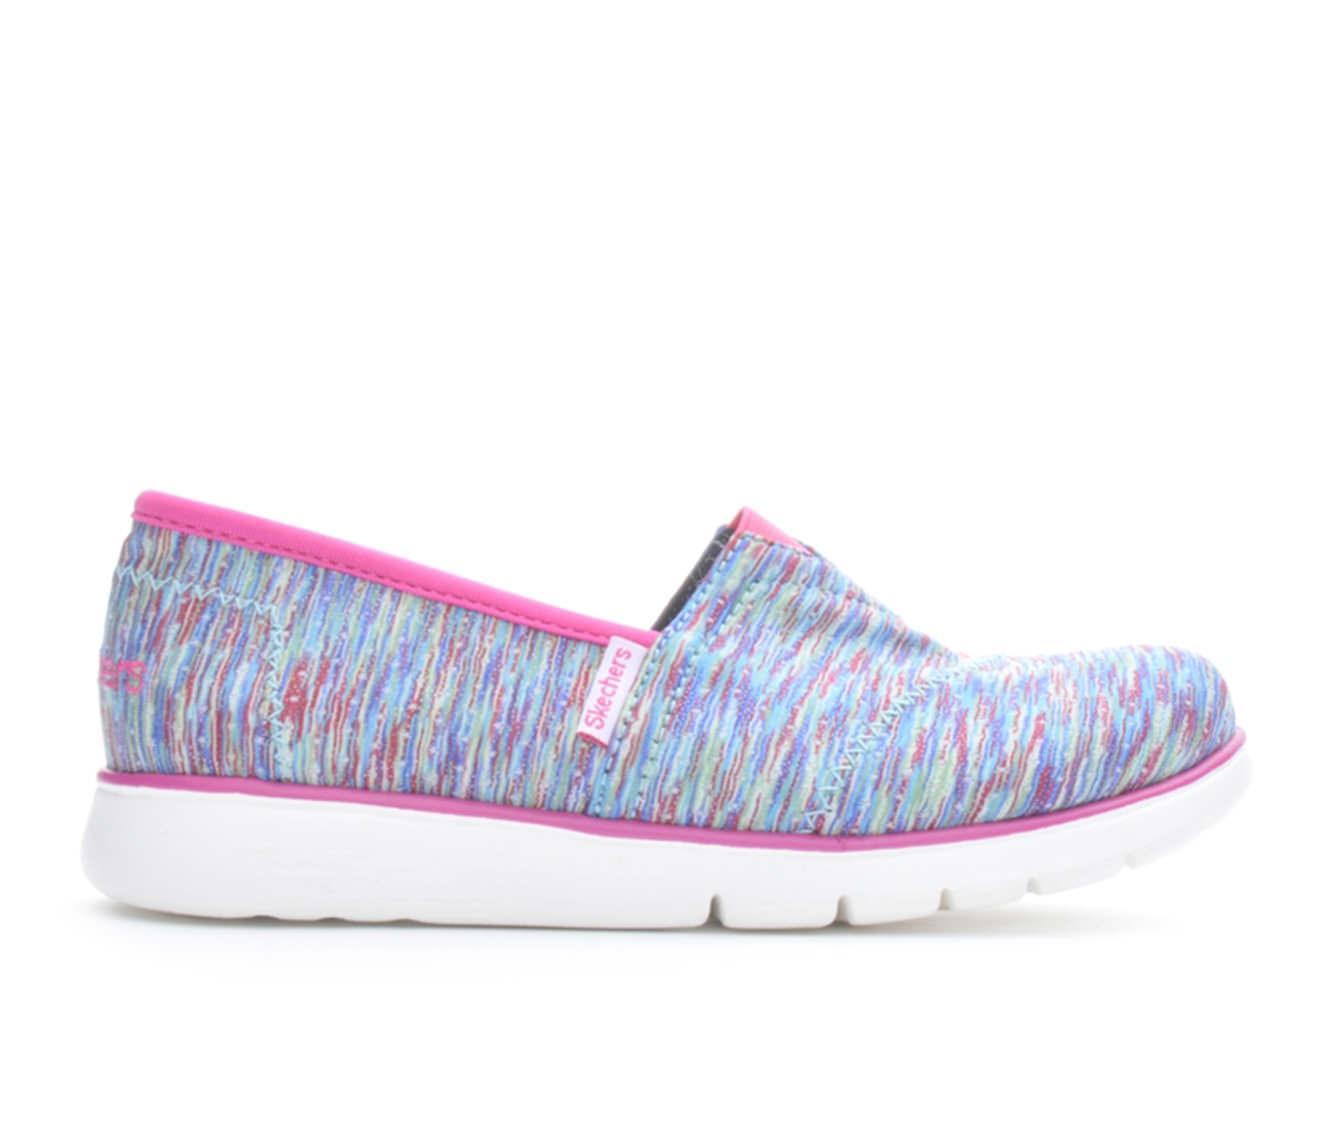 Girls' Skechers PureFlex Sprinter Stripes Children's Shoes (Multicolor)